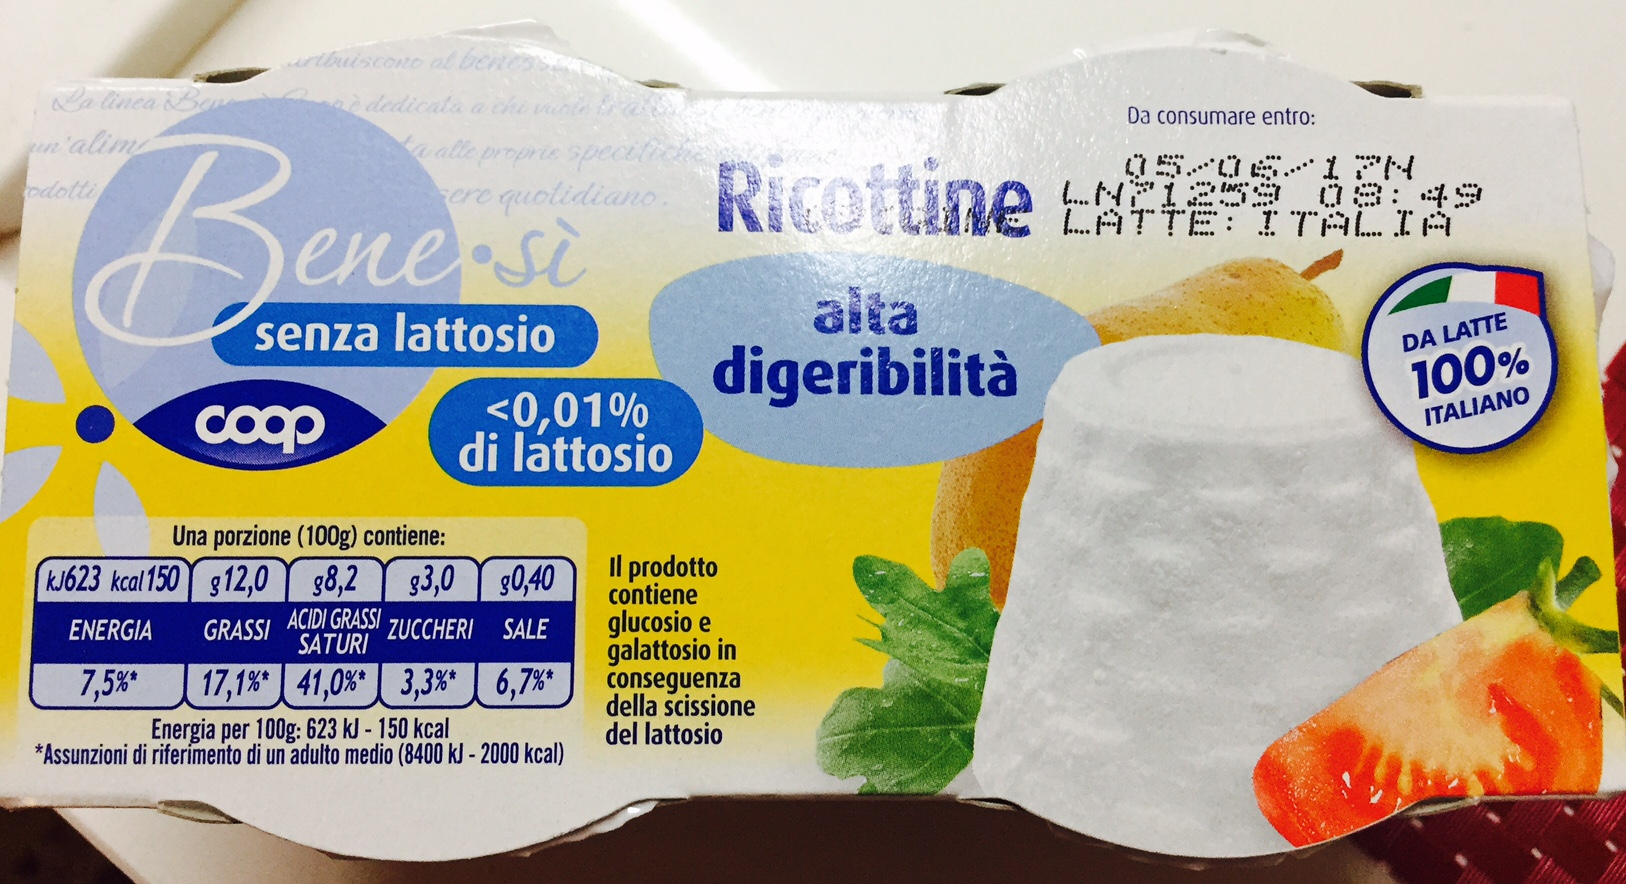 Ricottine Benesì Coop - lattosio <0,01 Image